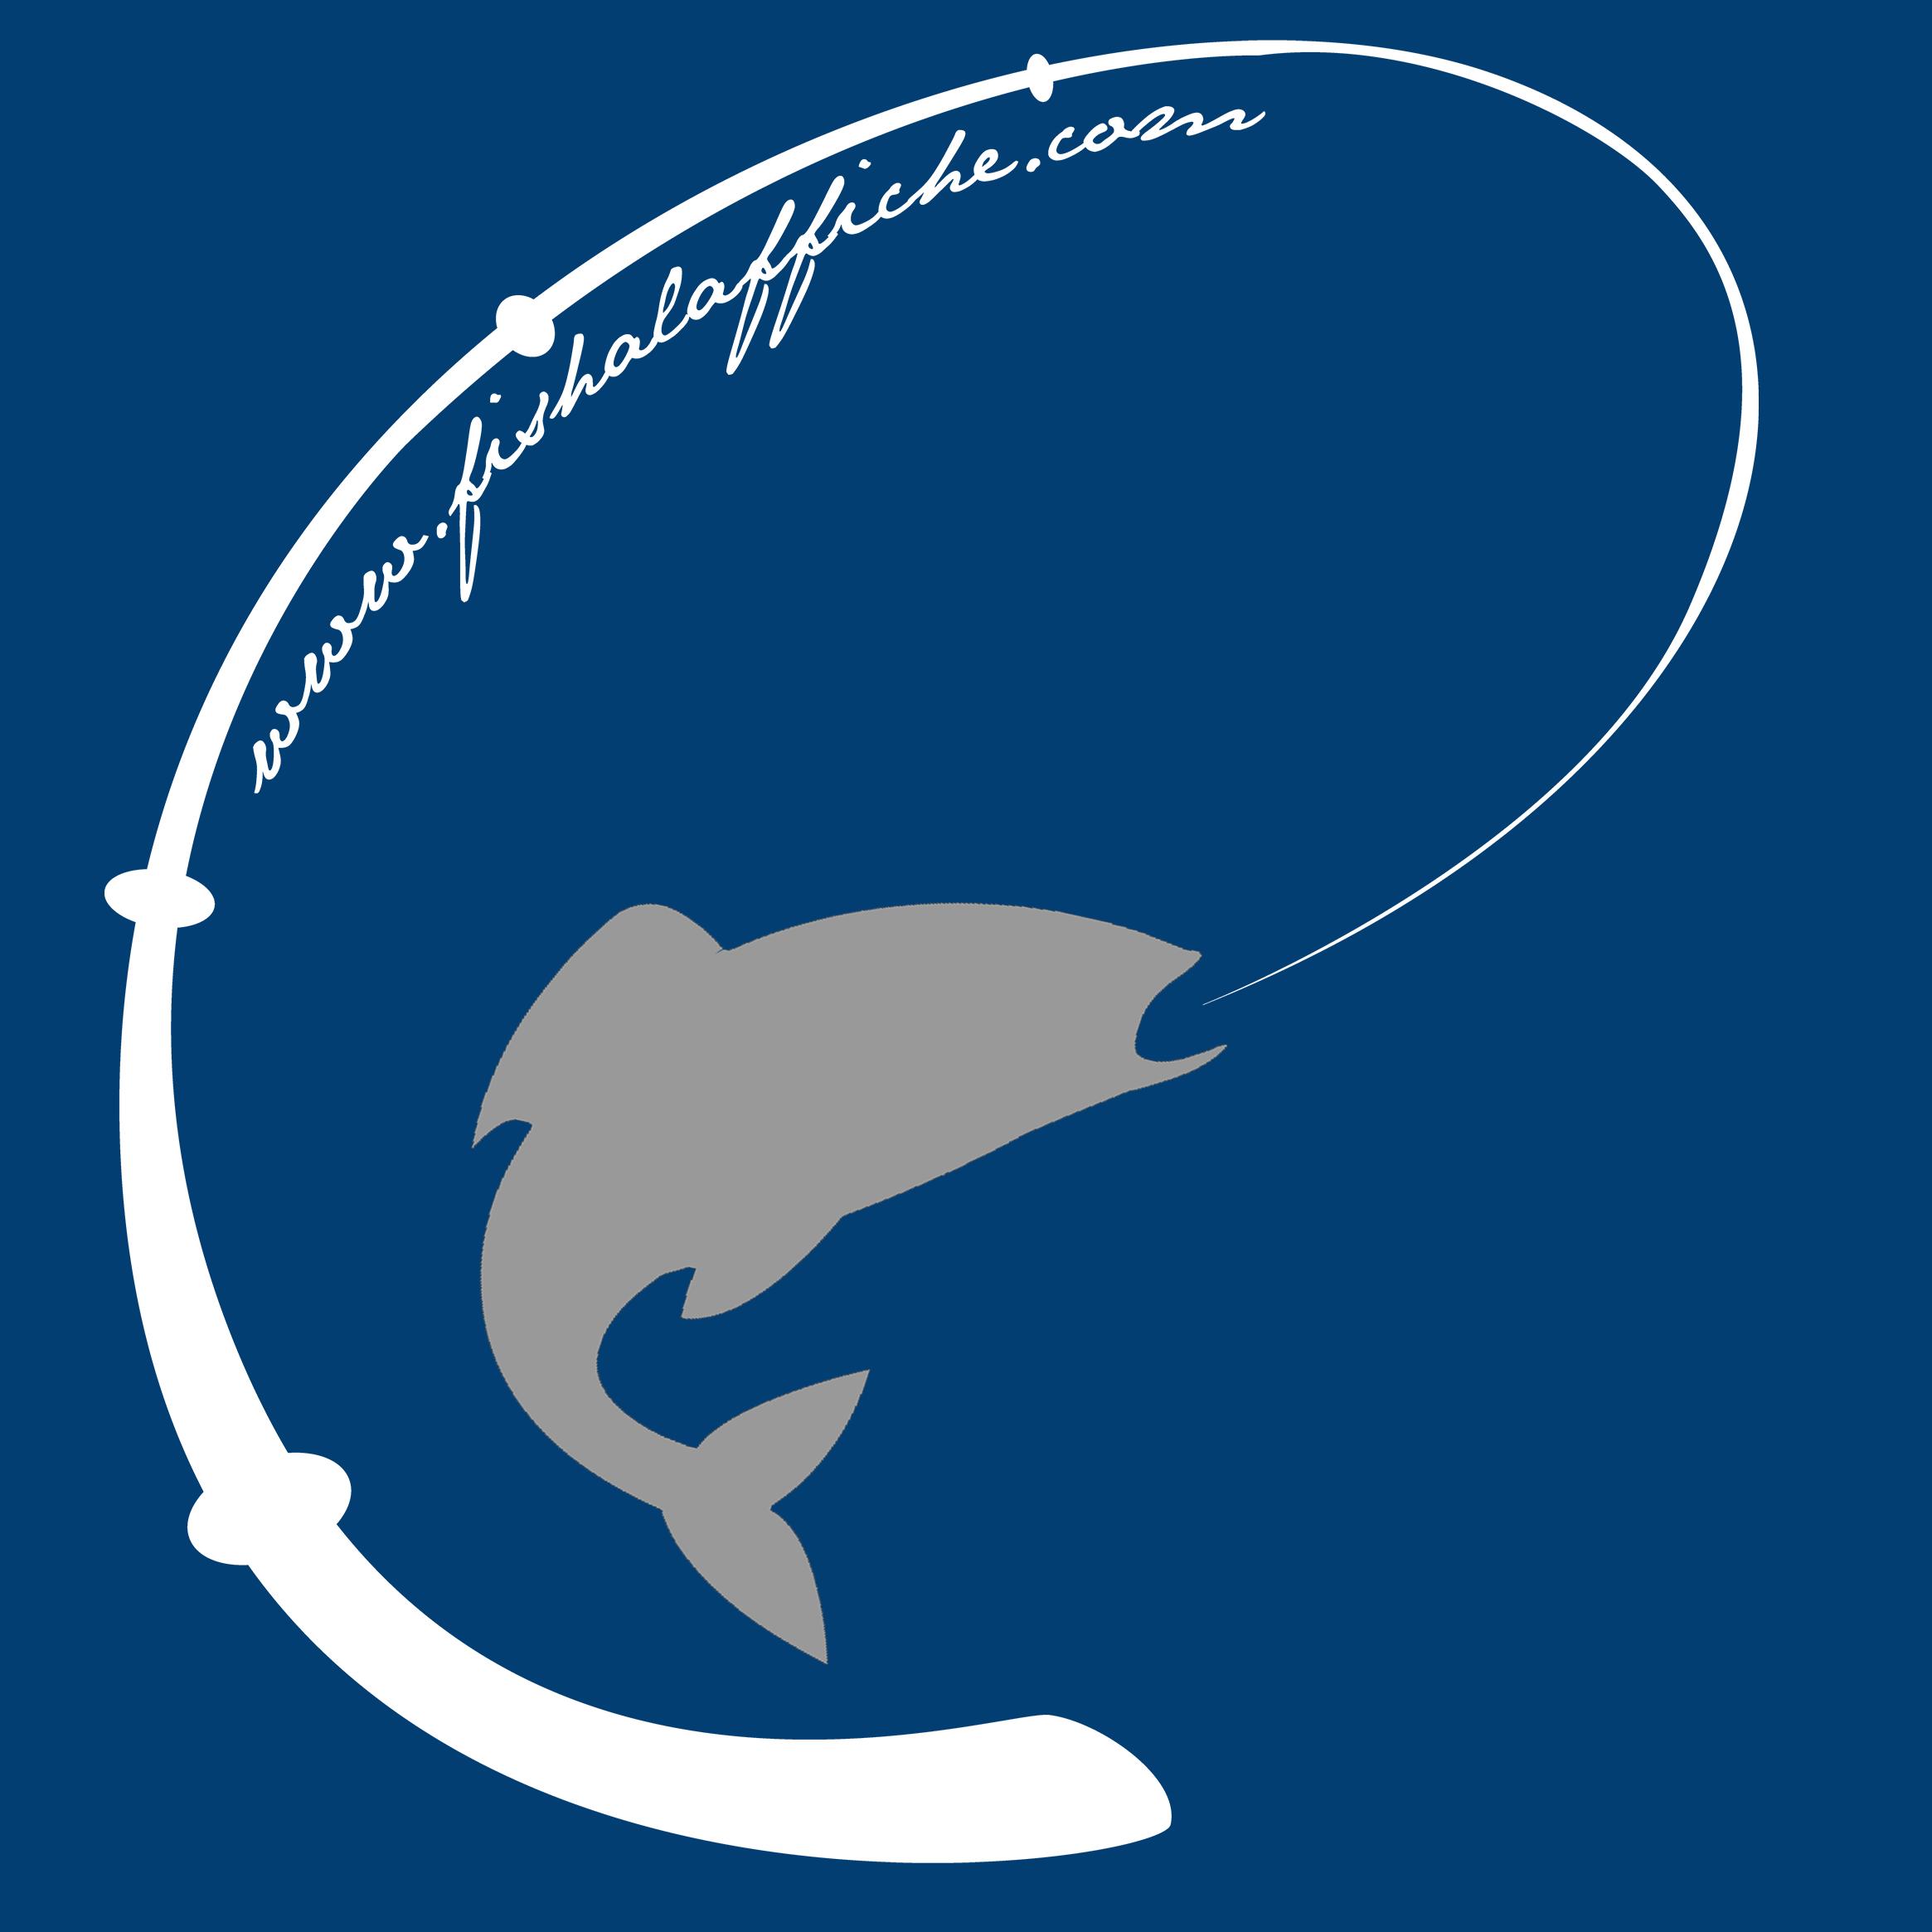 Le logo du blog